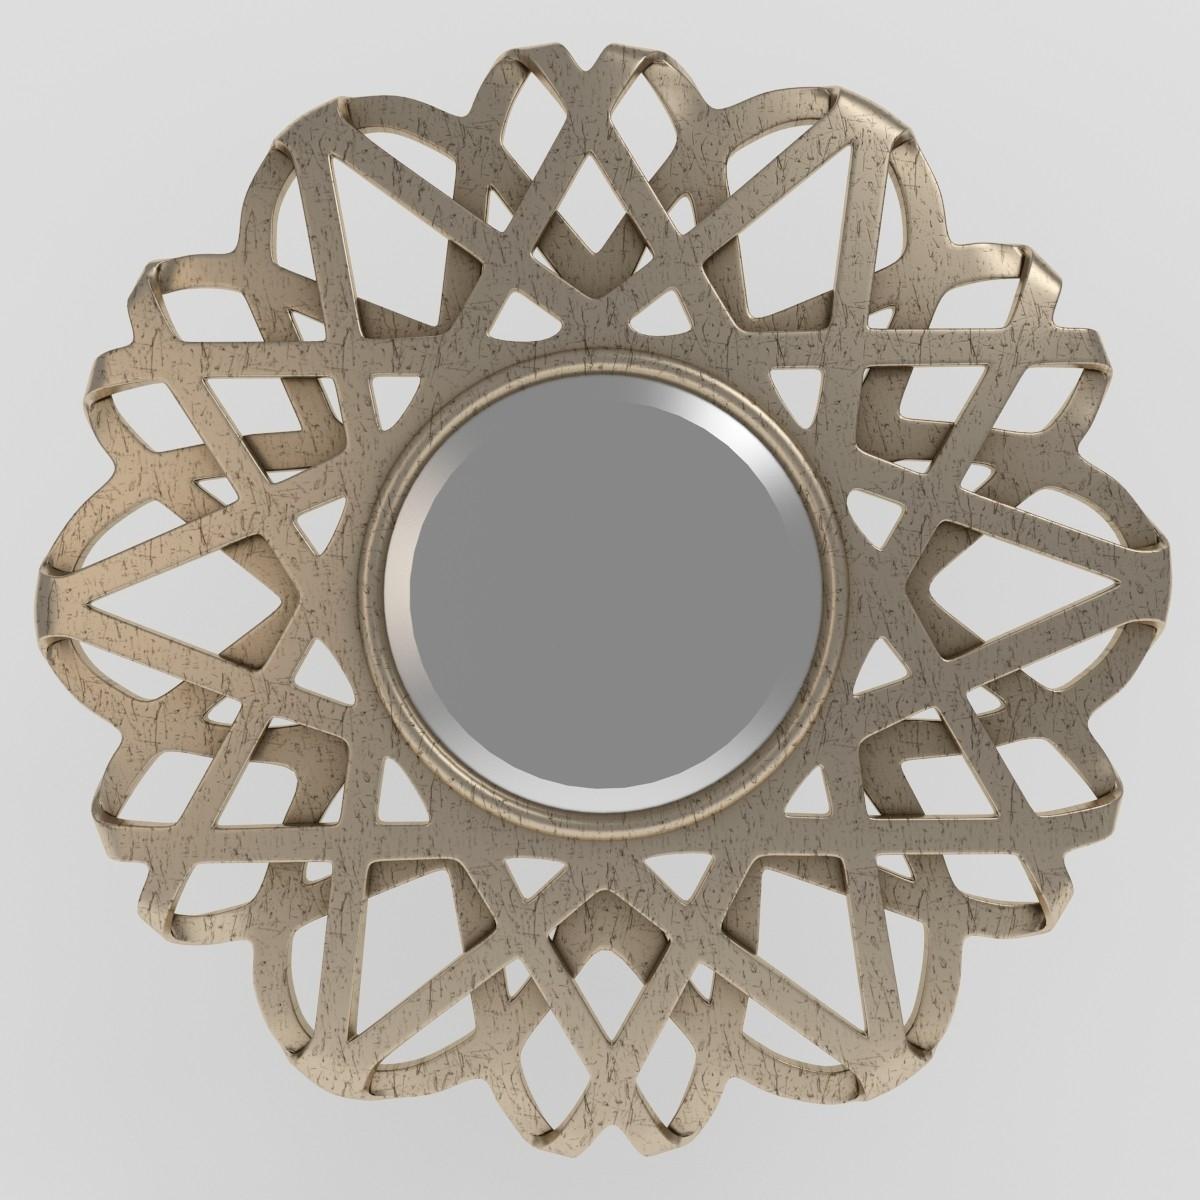 Kichler Rebound Silver Leaf Finish Wall Mirror